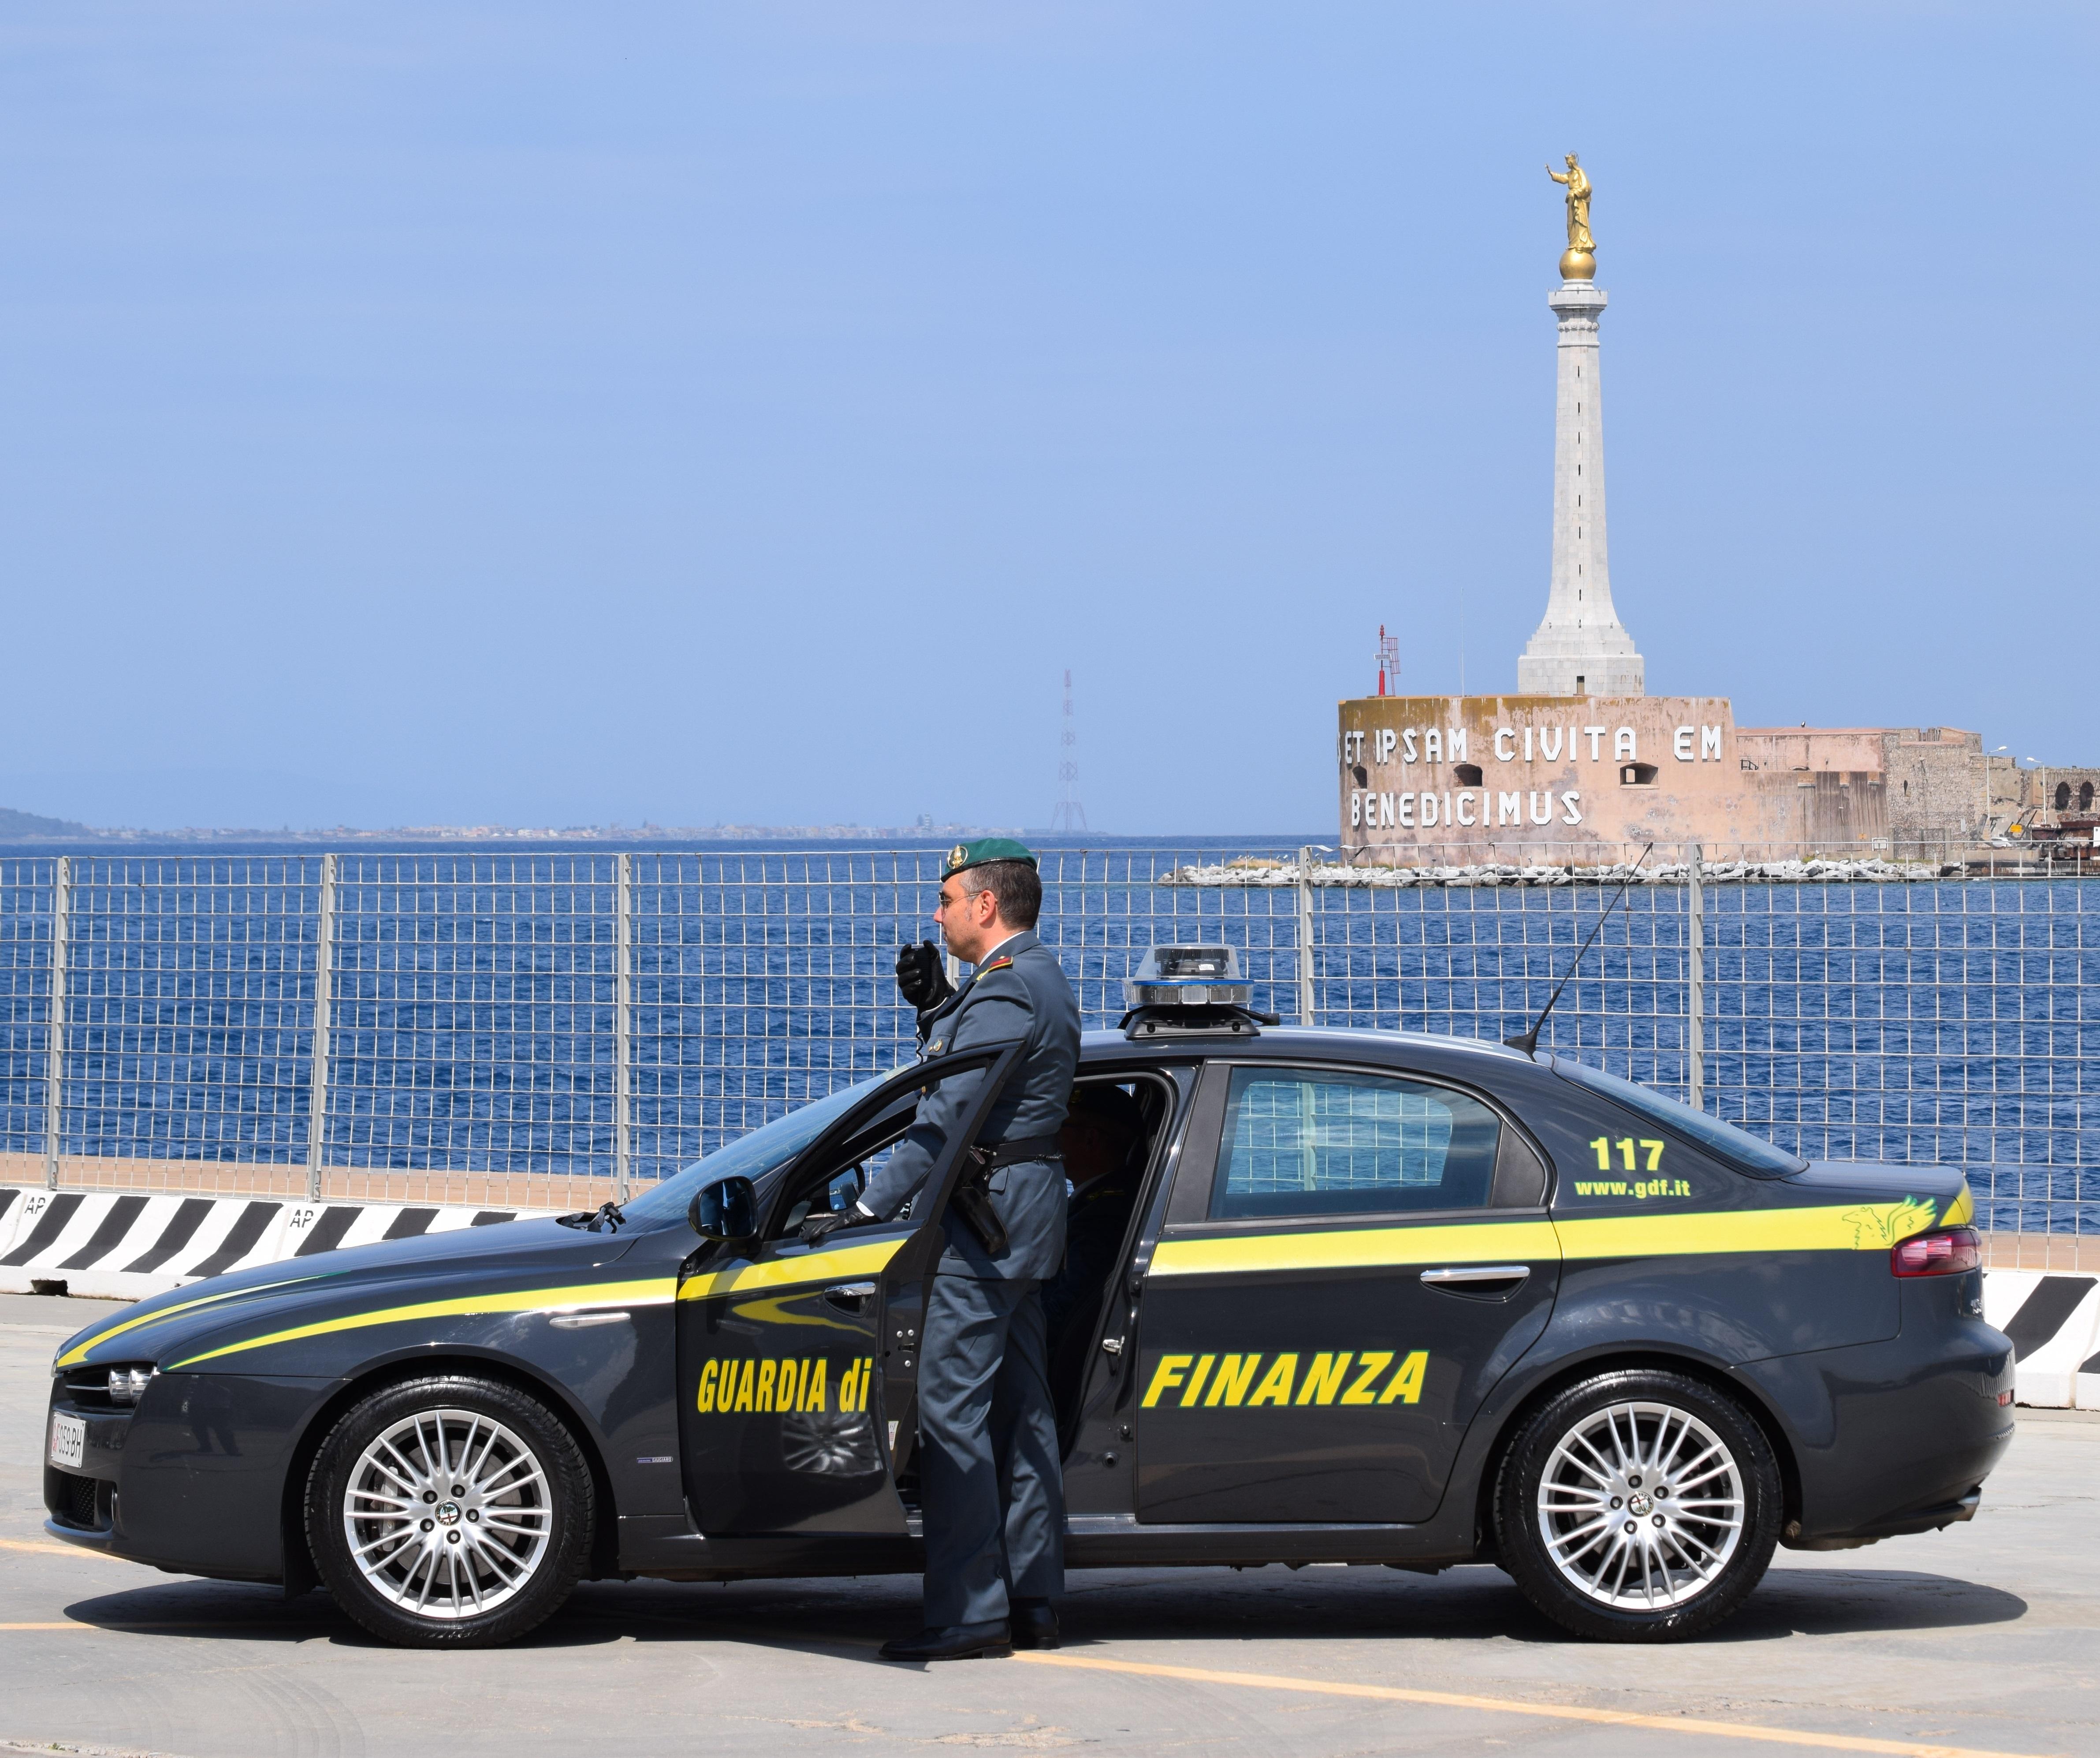 Bancarotta fraudolenta, ordinanza per un imprenditore a Messina